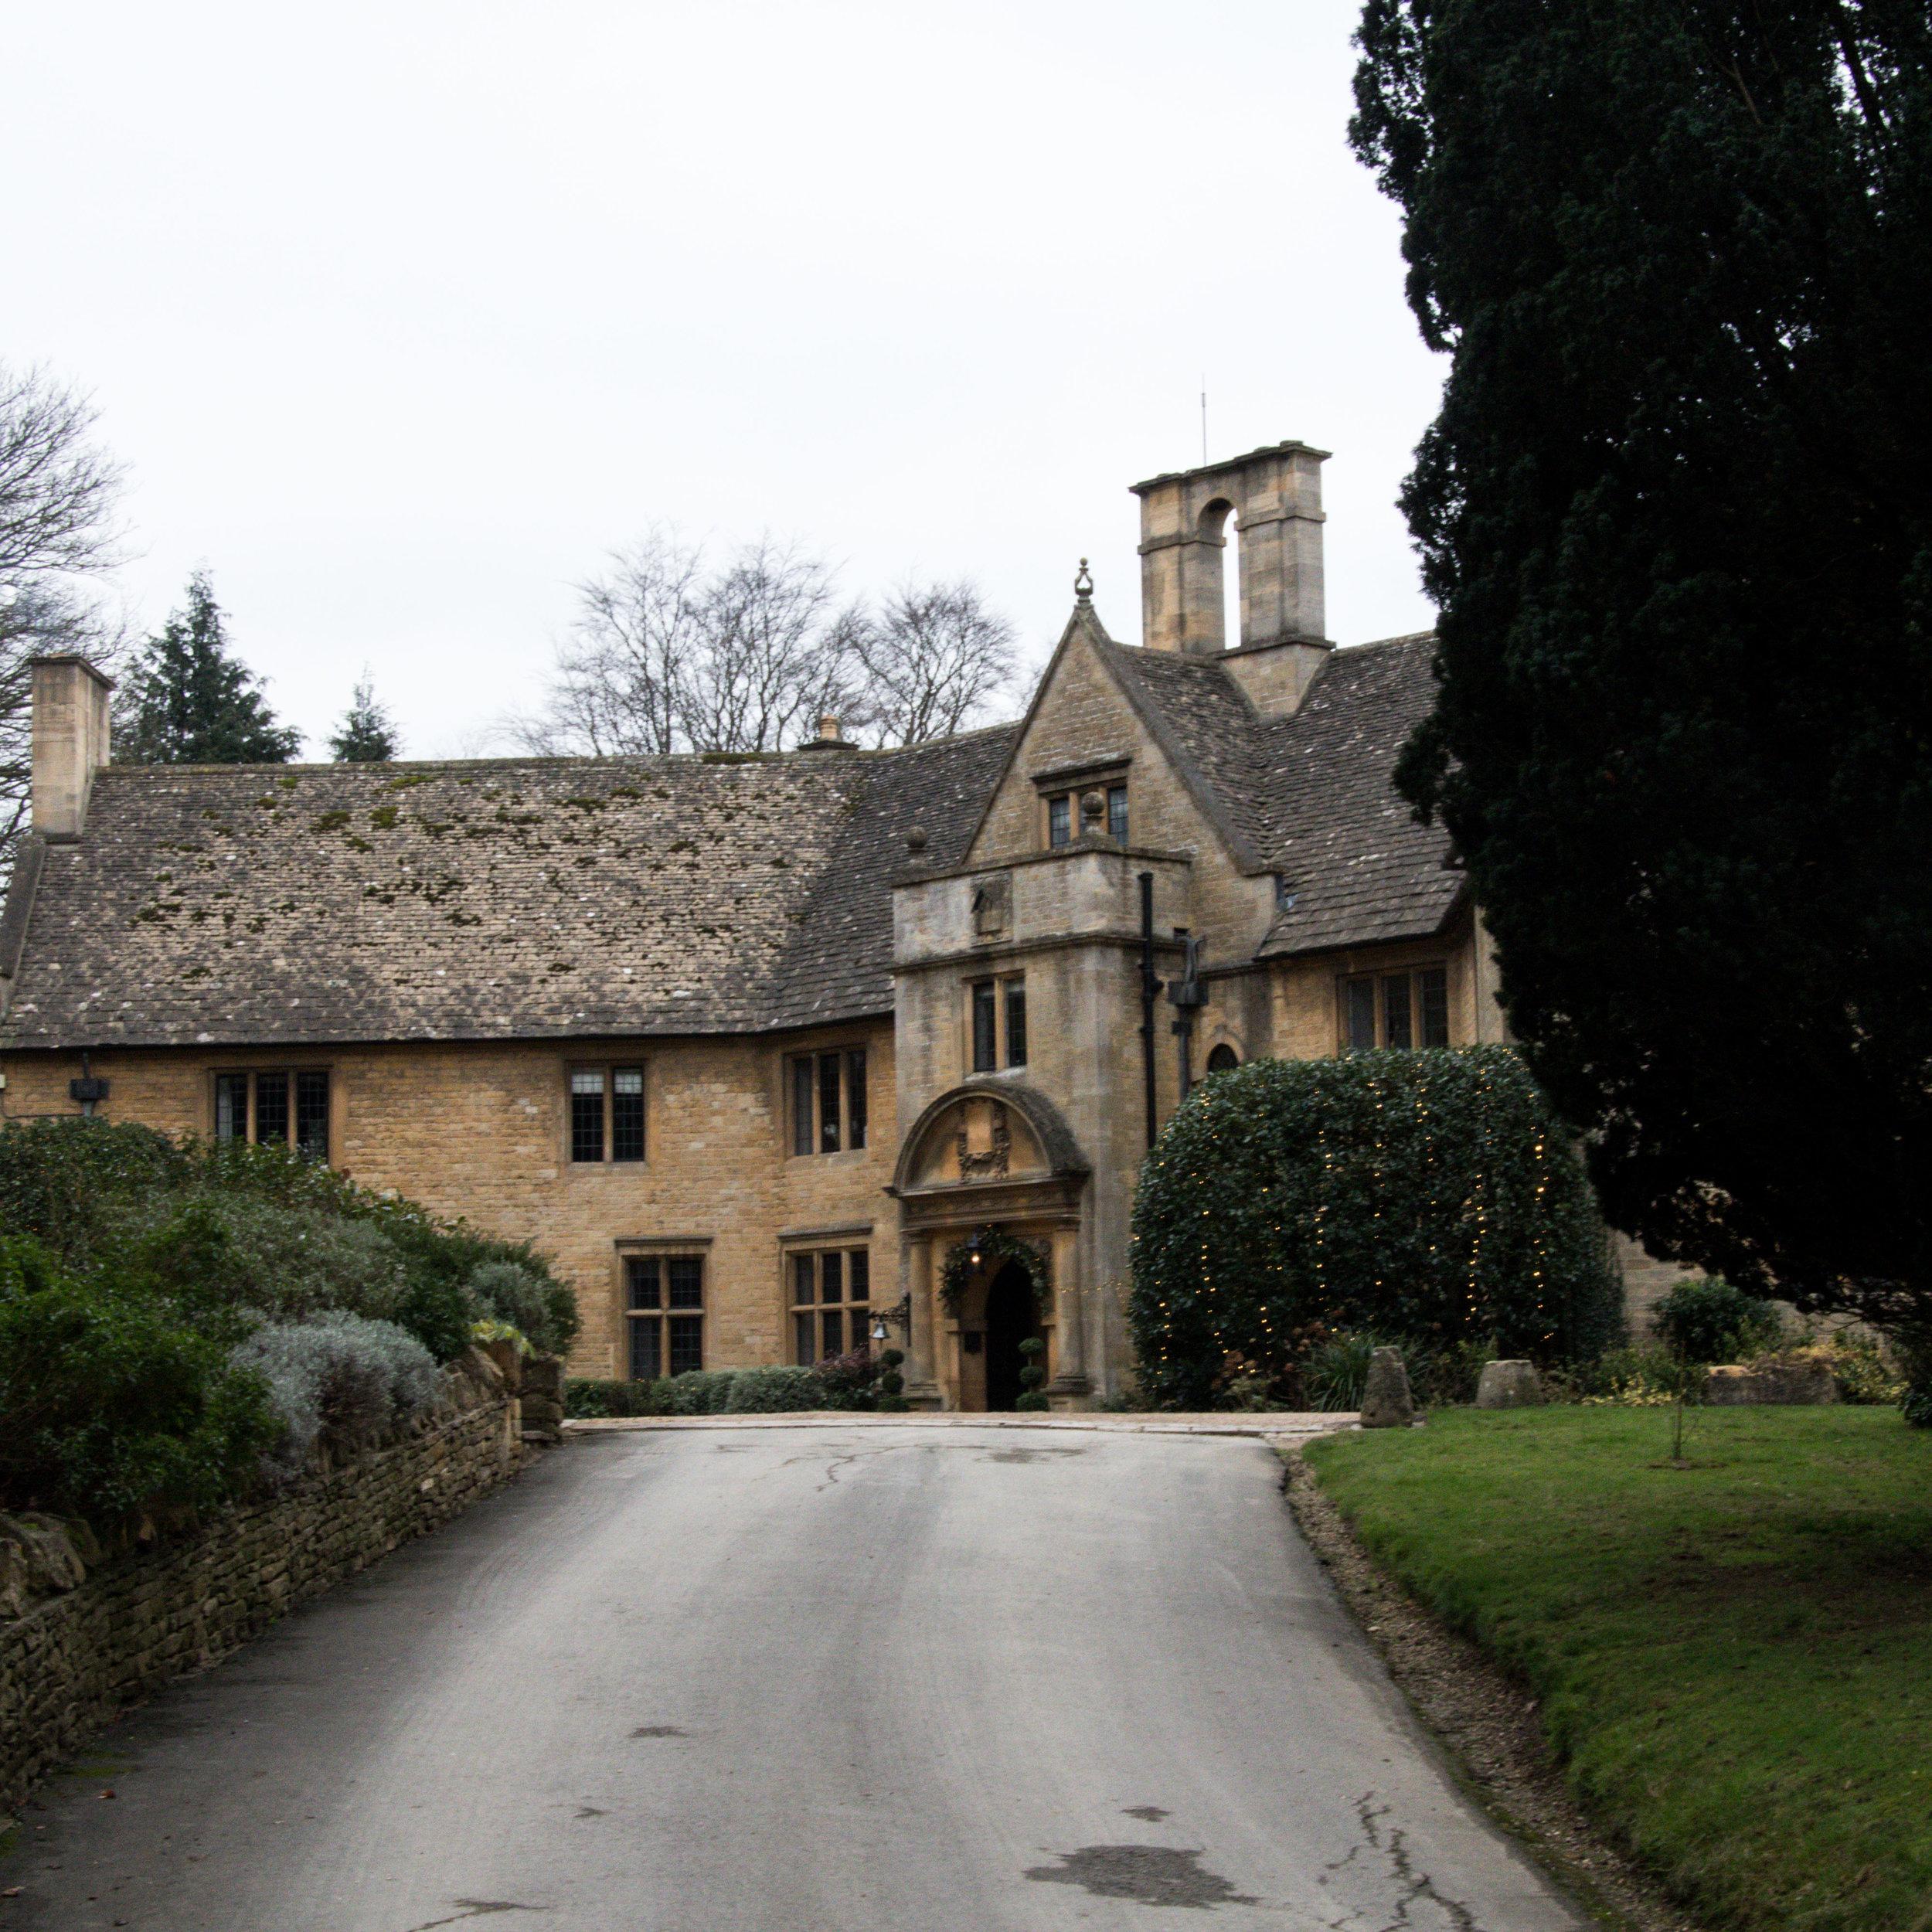 Foxhill Manor - Broadway